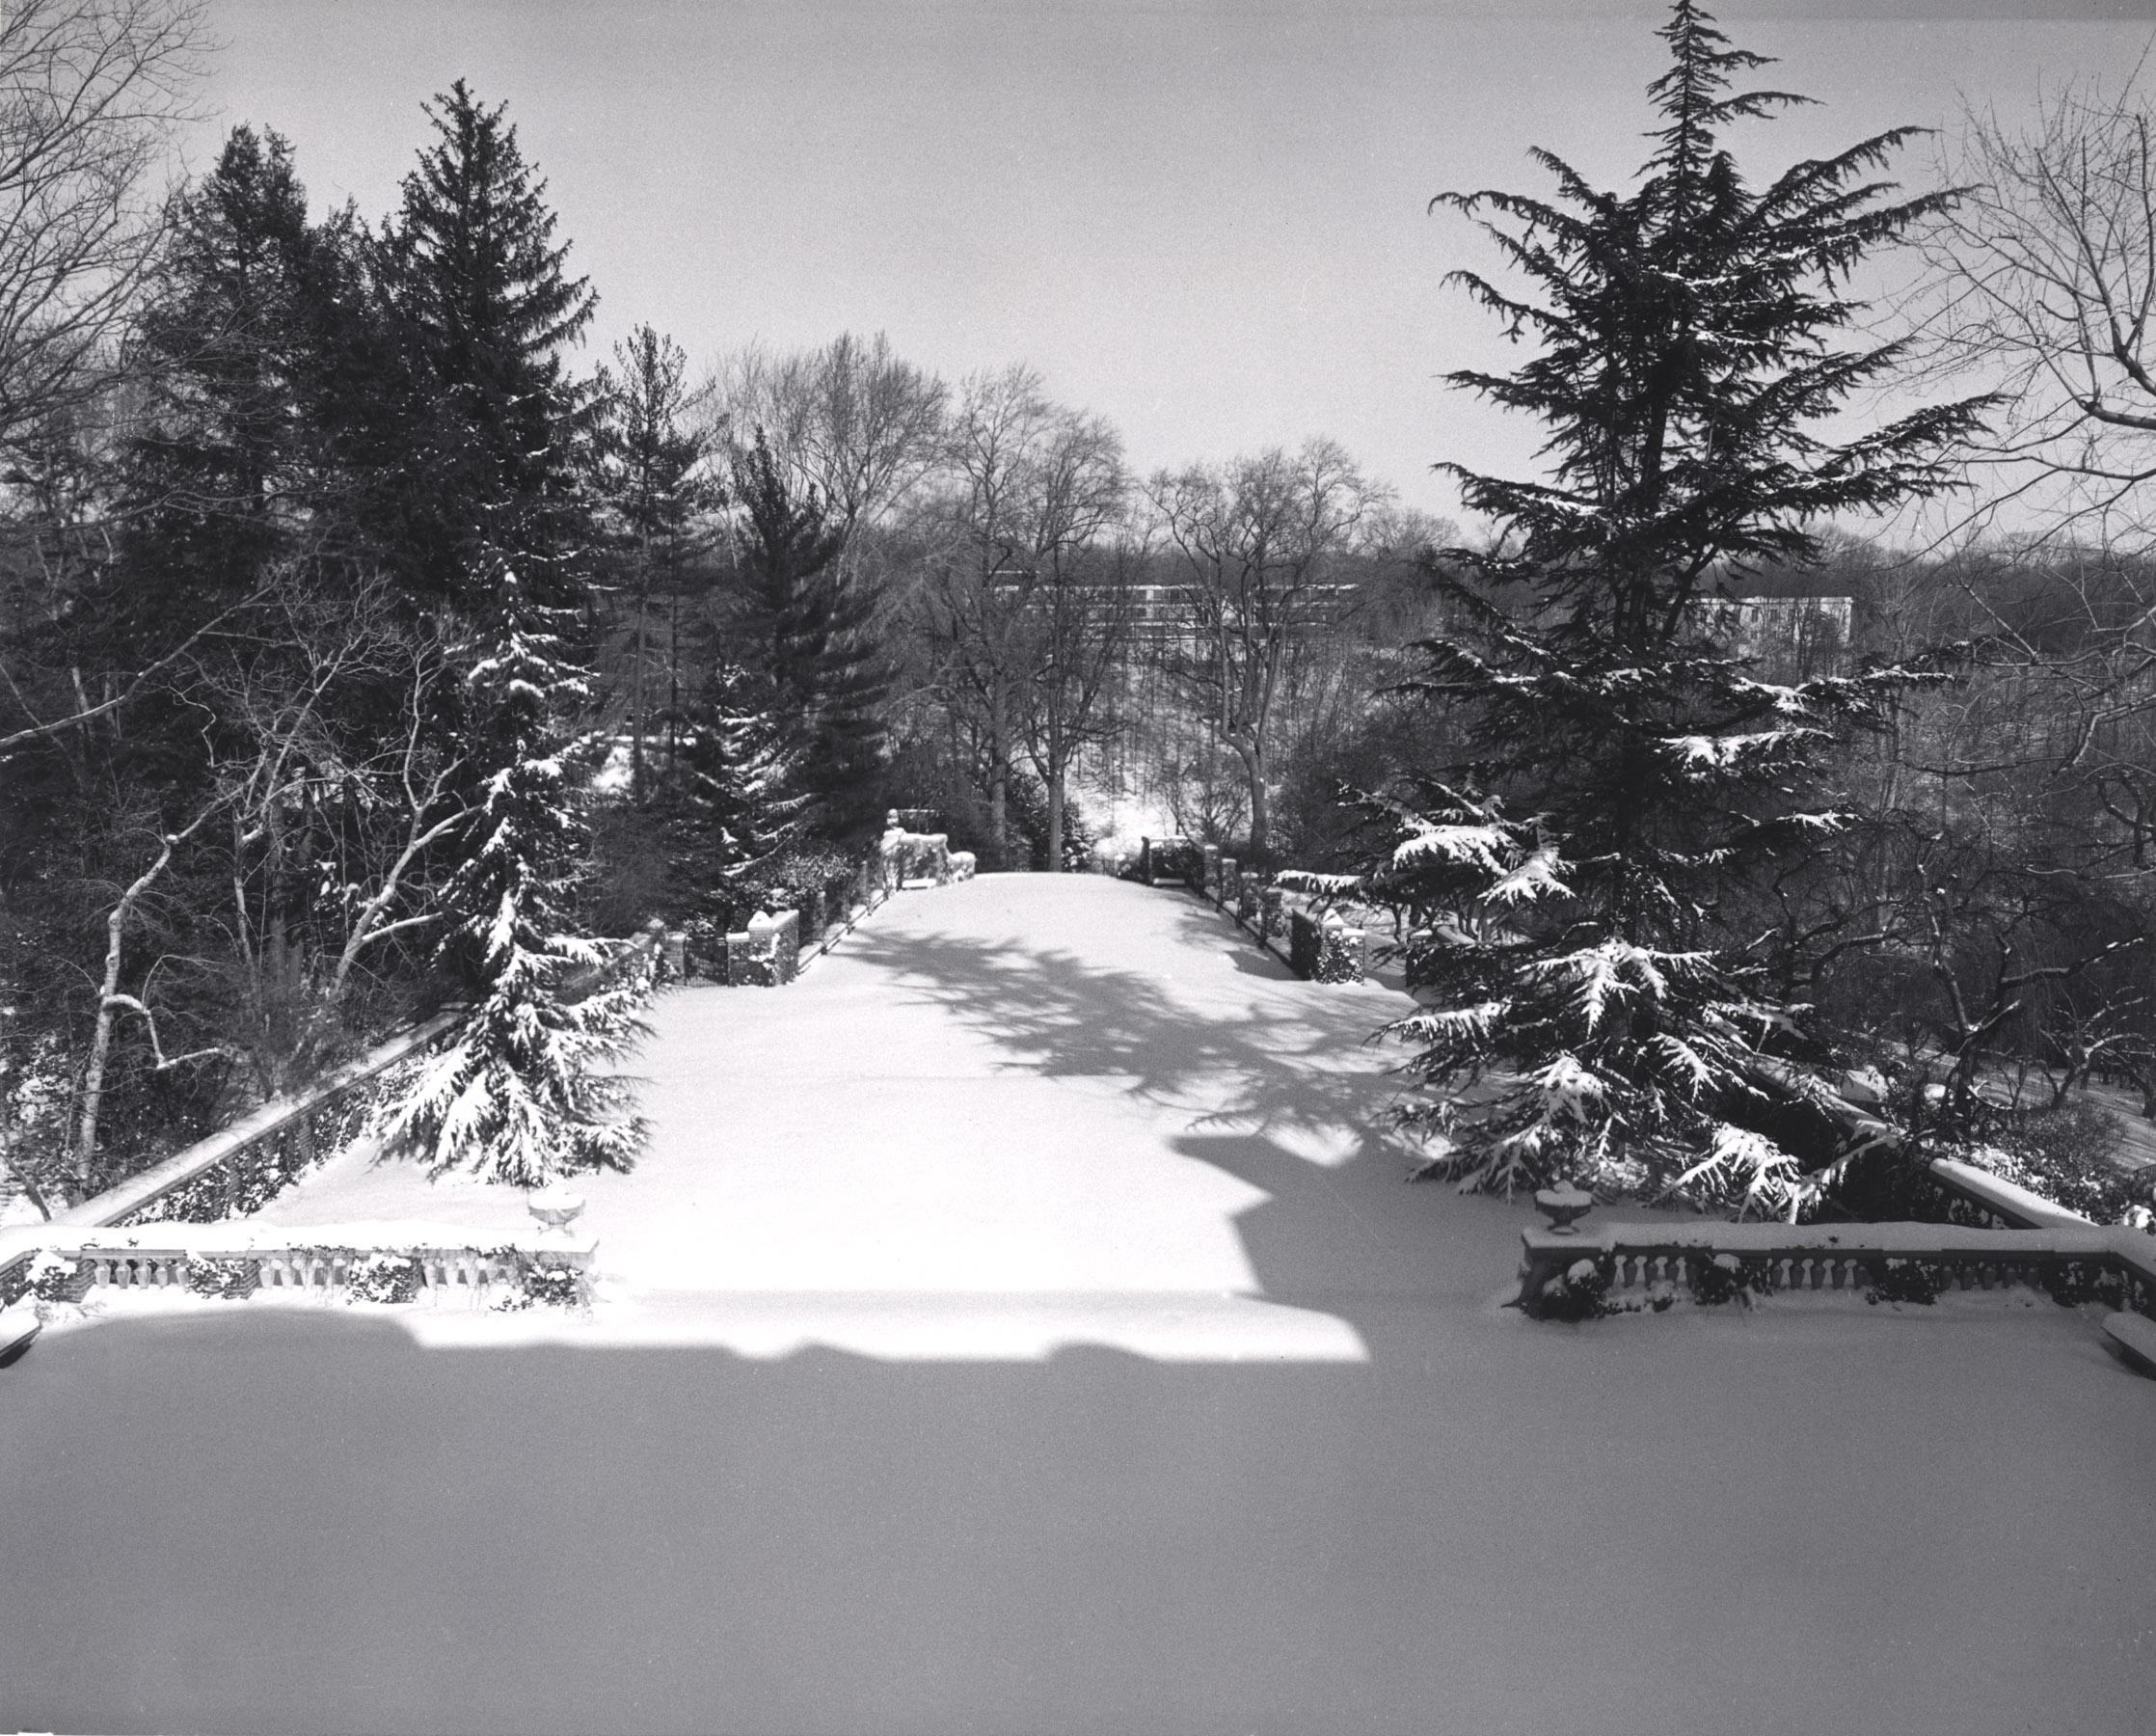 The North Vista at Dumbarton Oaks under snowfall.